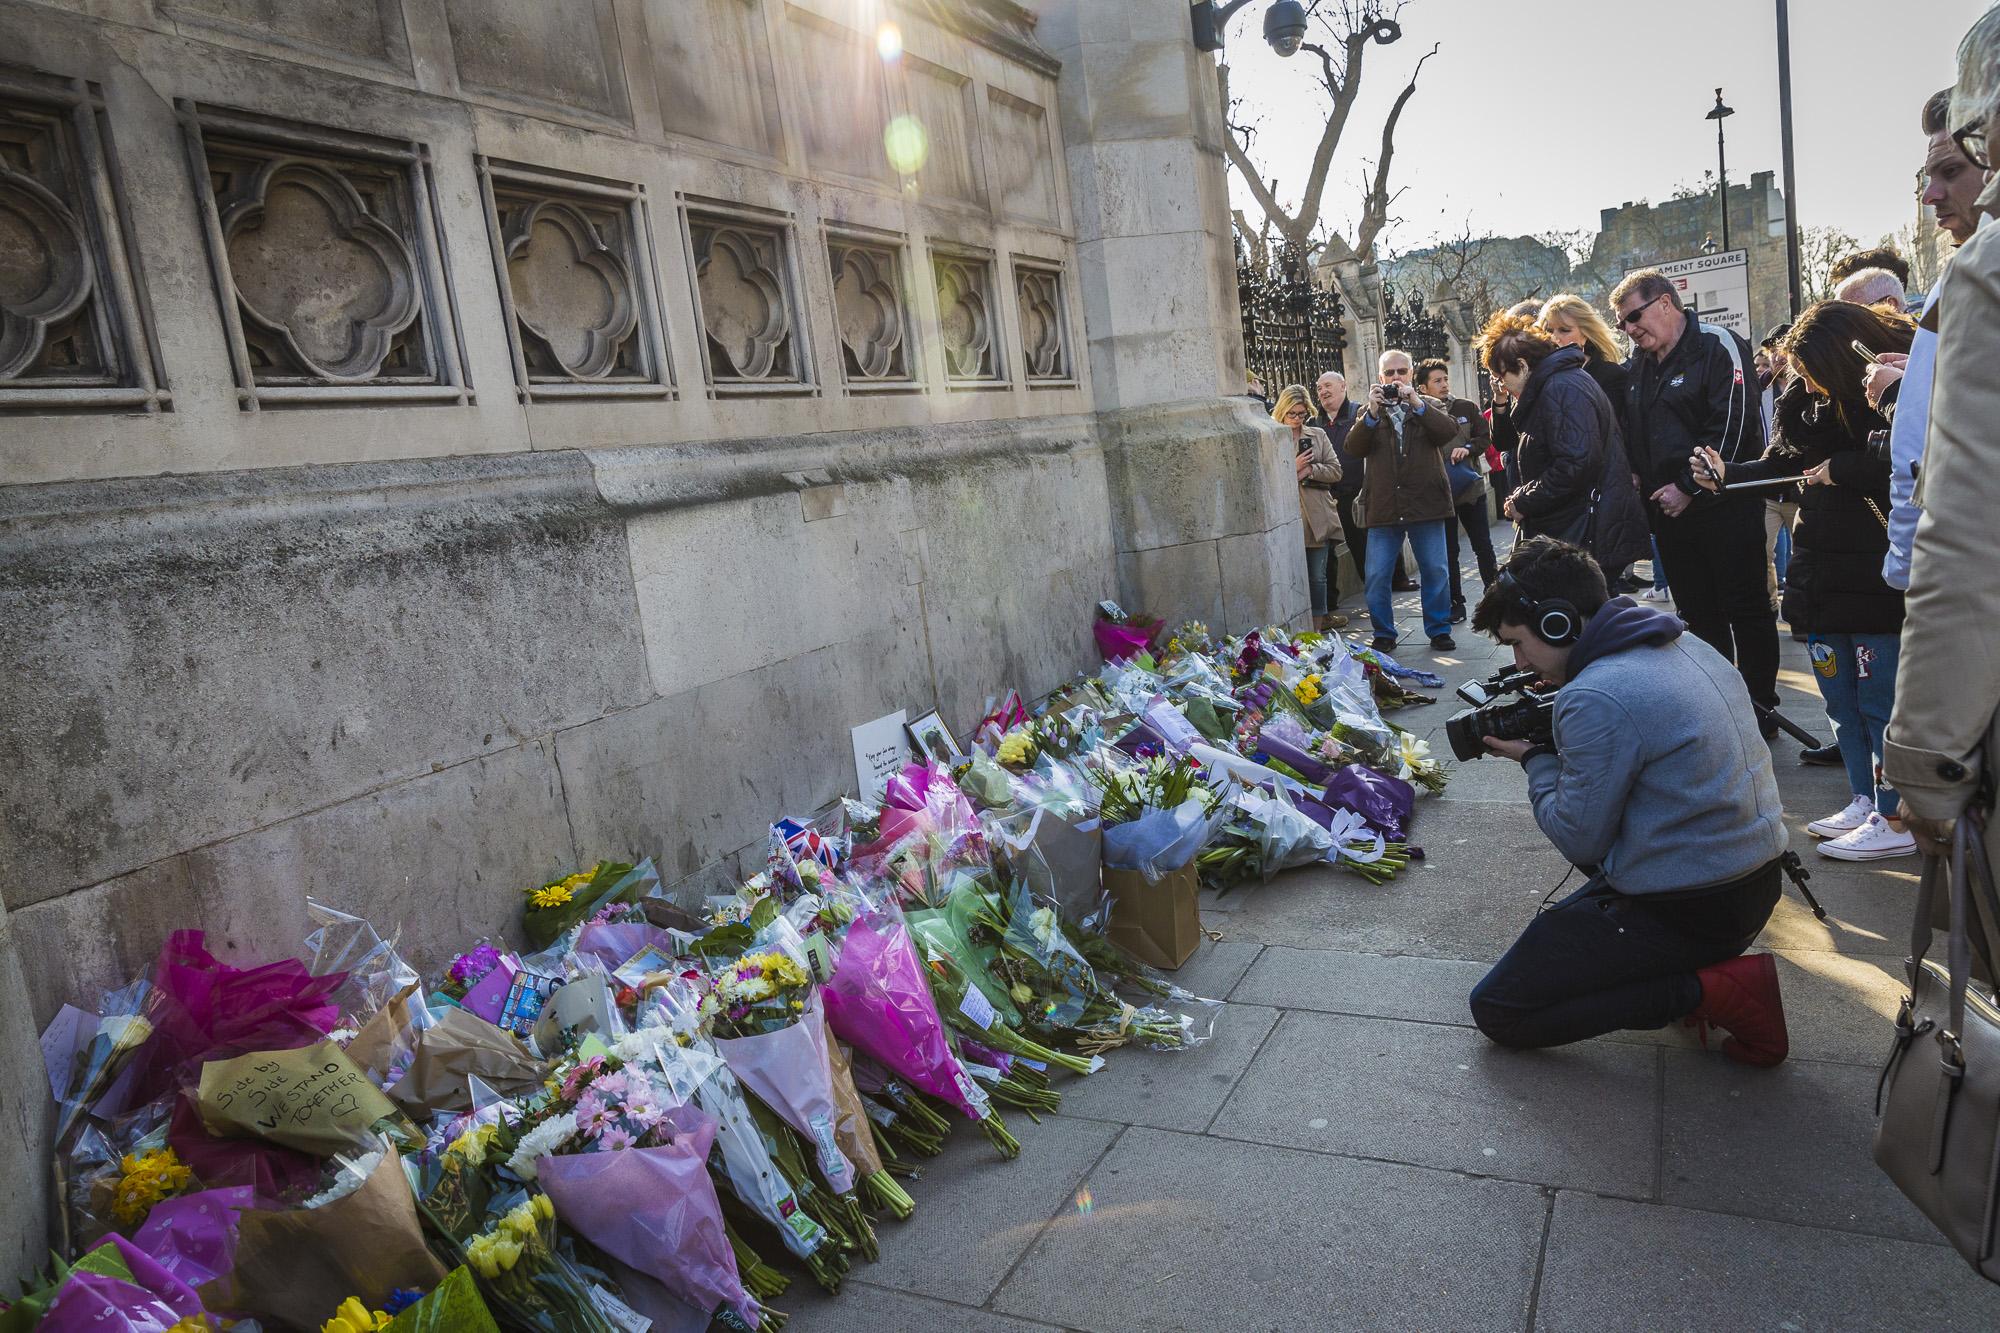 London_Attack_Hope_Not_Hate-11.jpg